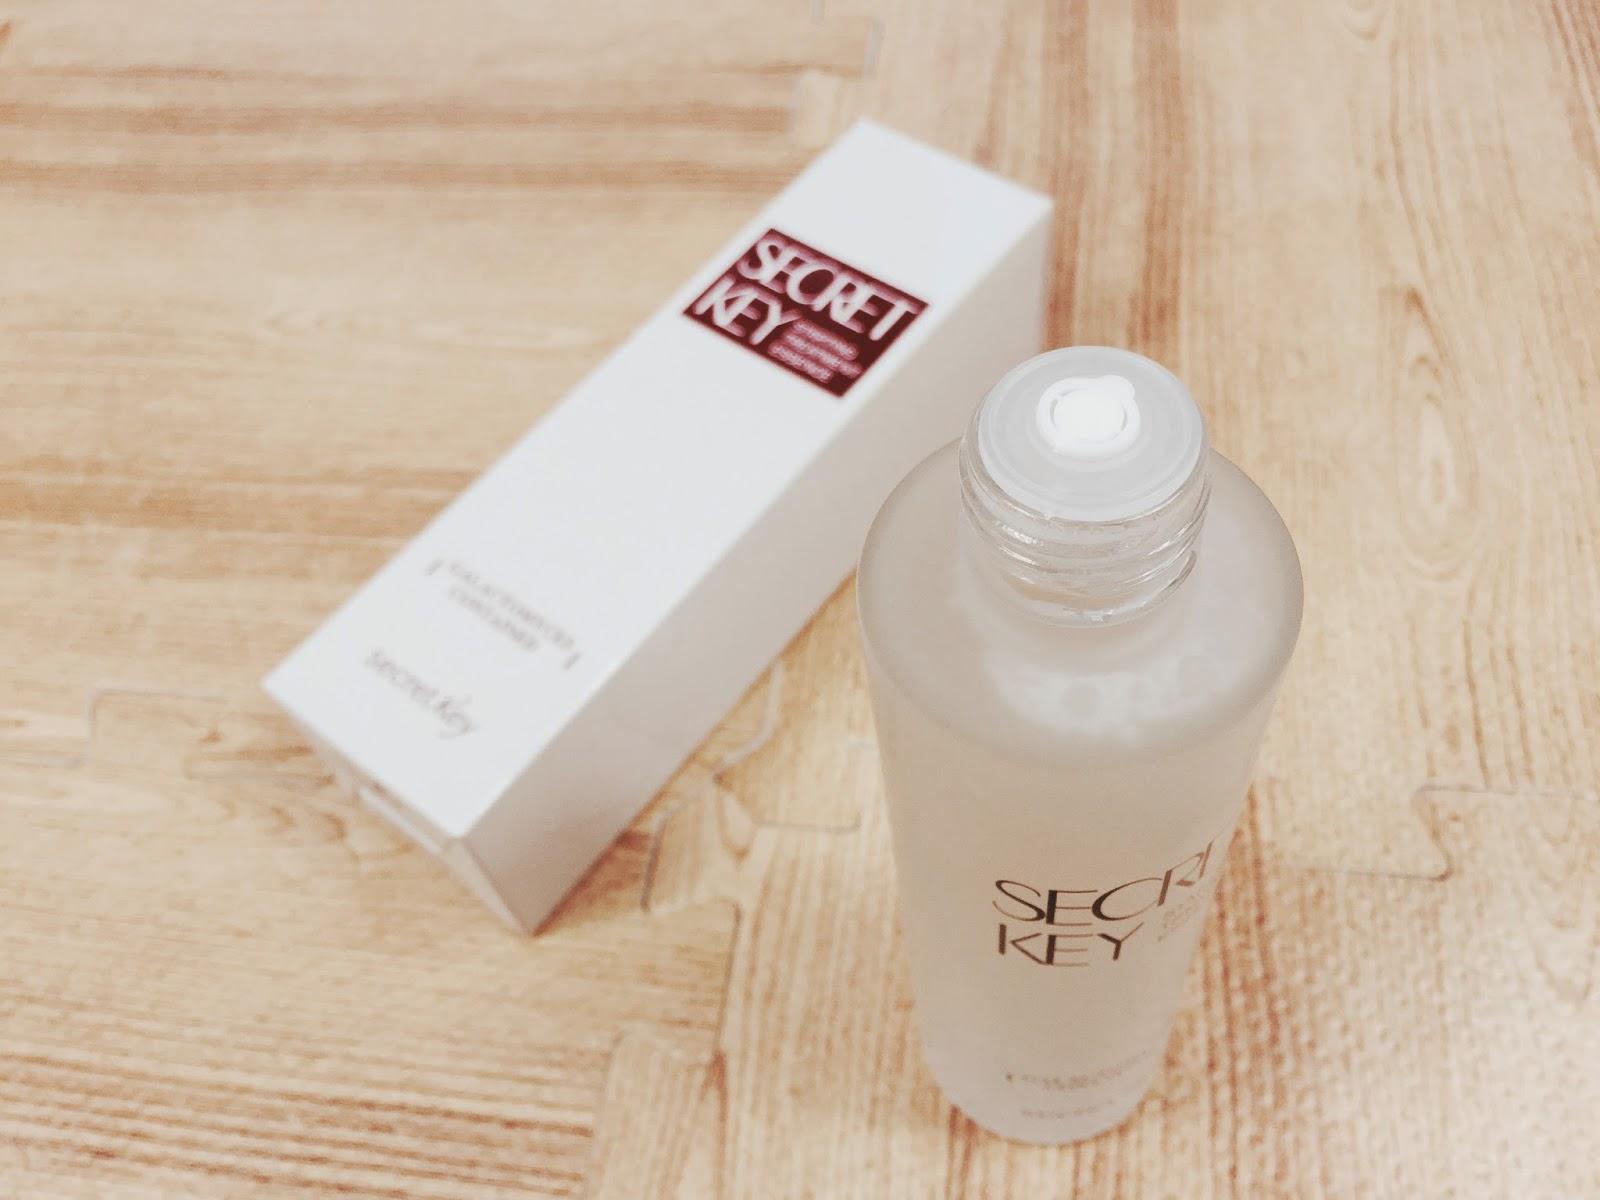 Secret Key Starting Treatment Essence Gold 24k Daftar Update Harga Cream 50gr Review